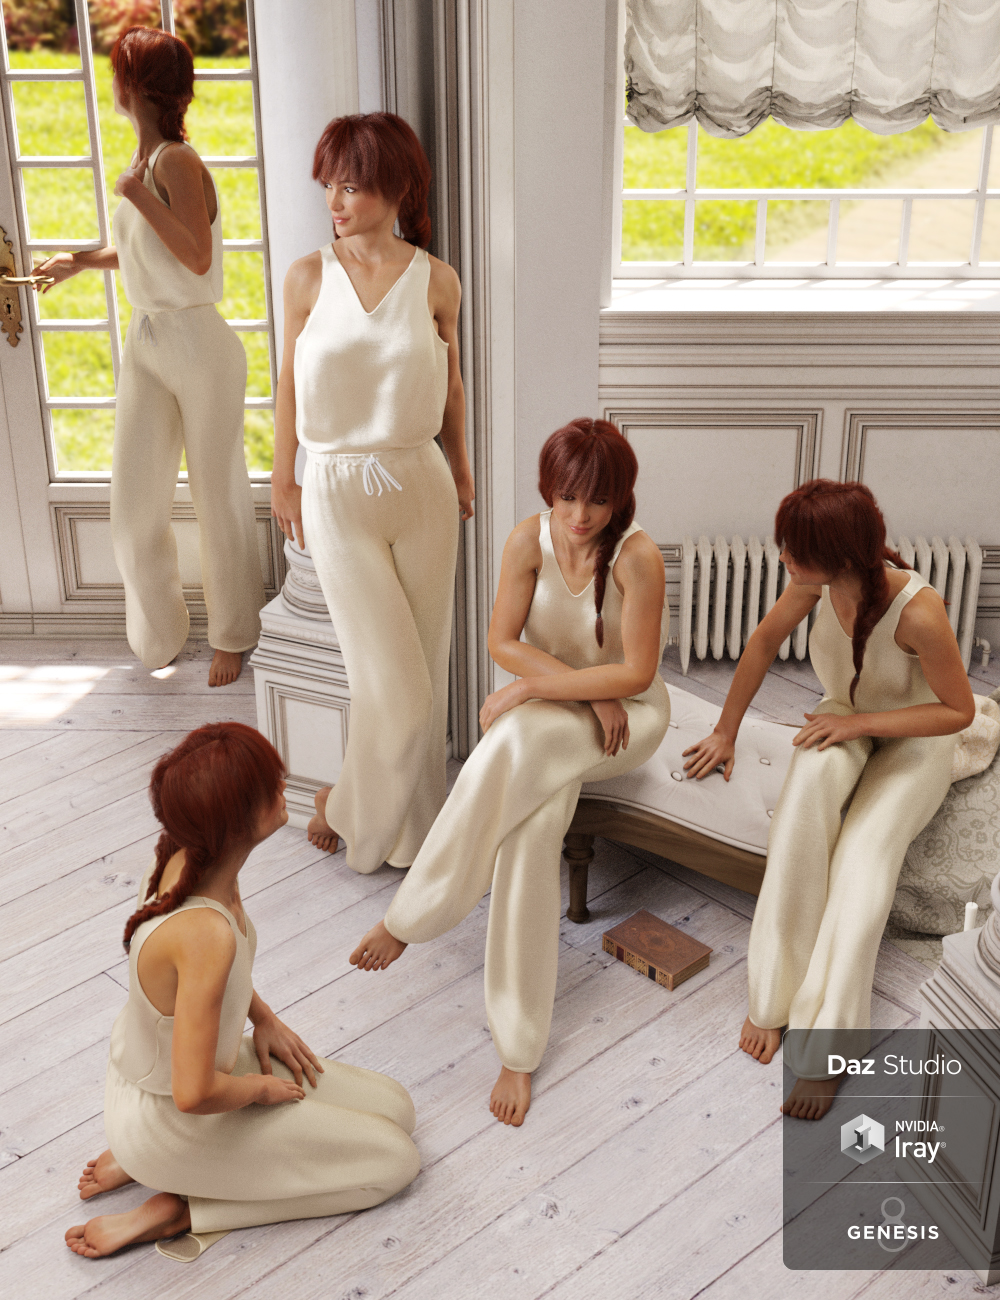 Rural Chateau III Retreat Poses Genesis 8 Female by: DianePredatron, 3D Models by Daz 3D